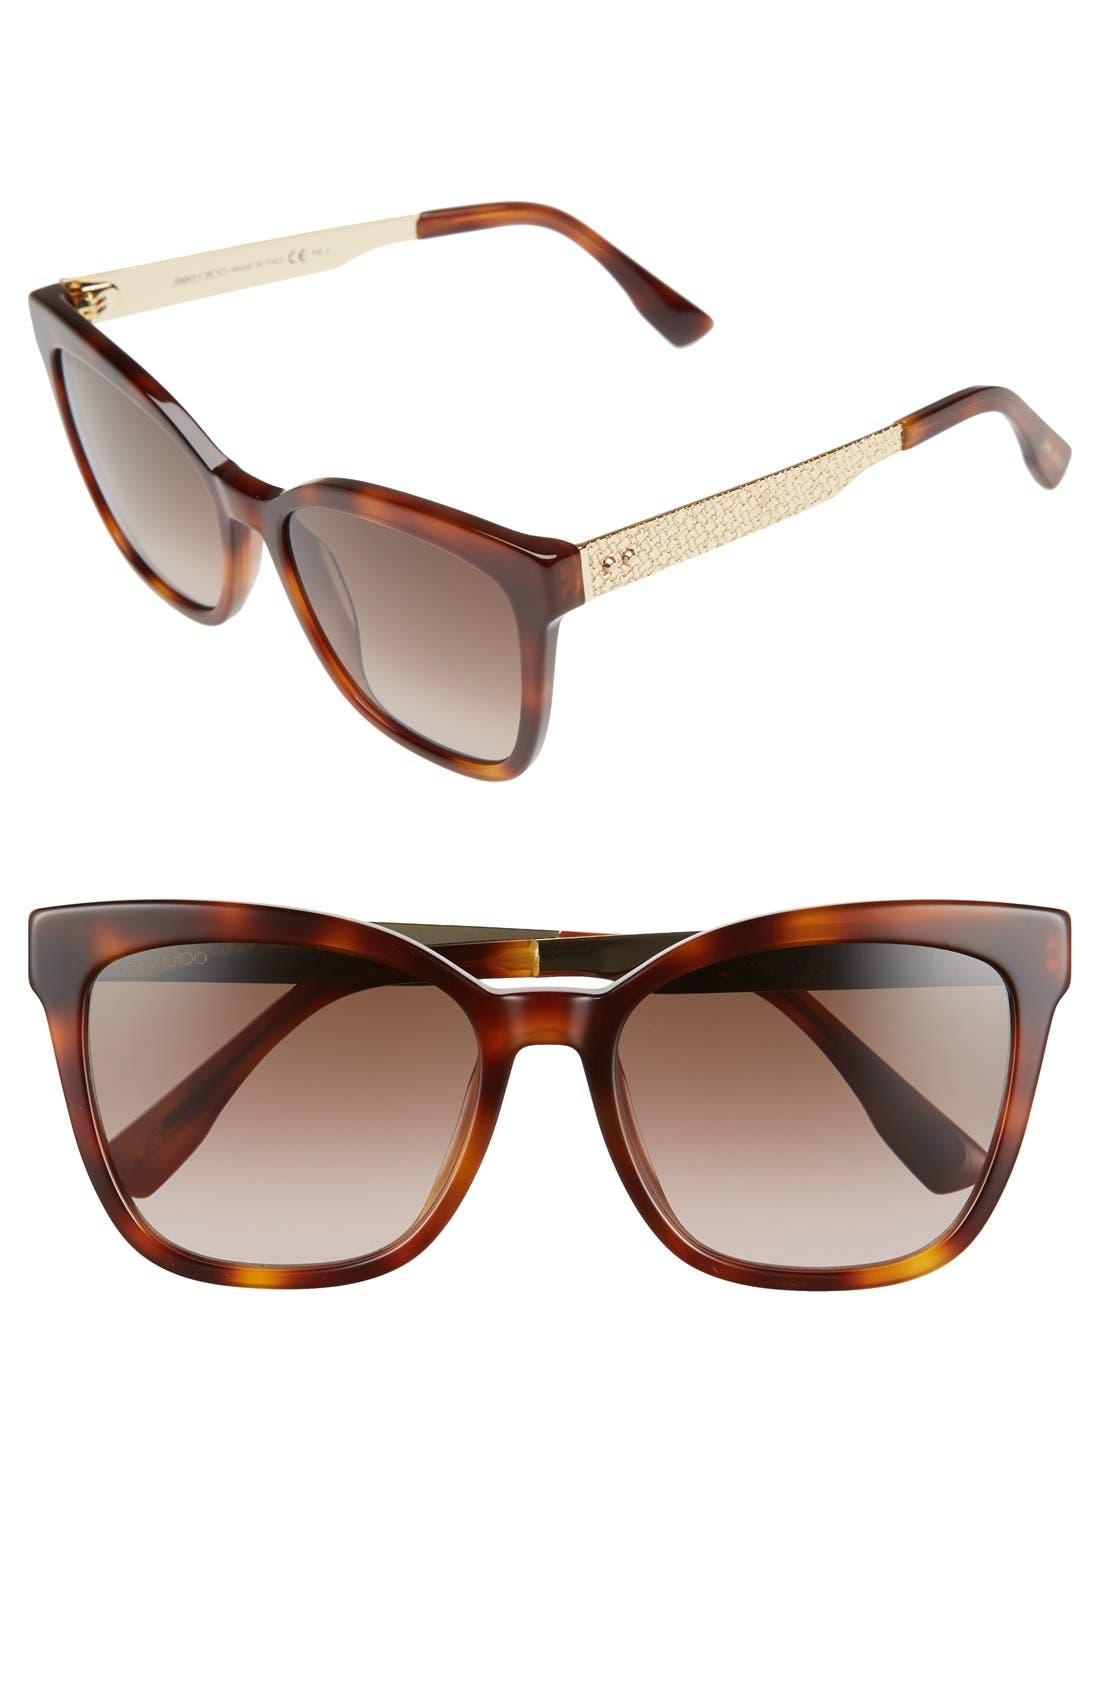 55mm Retro Sunglasses,                         Main,                         color, Havana